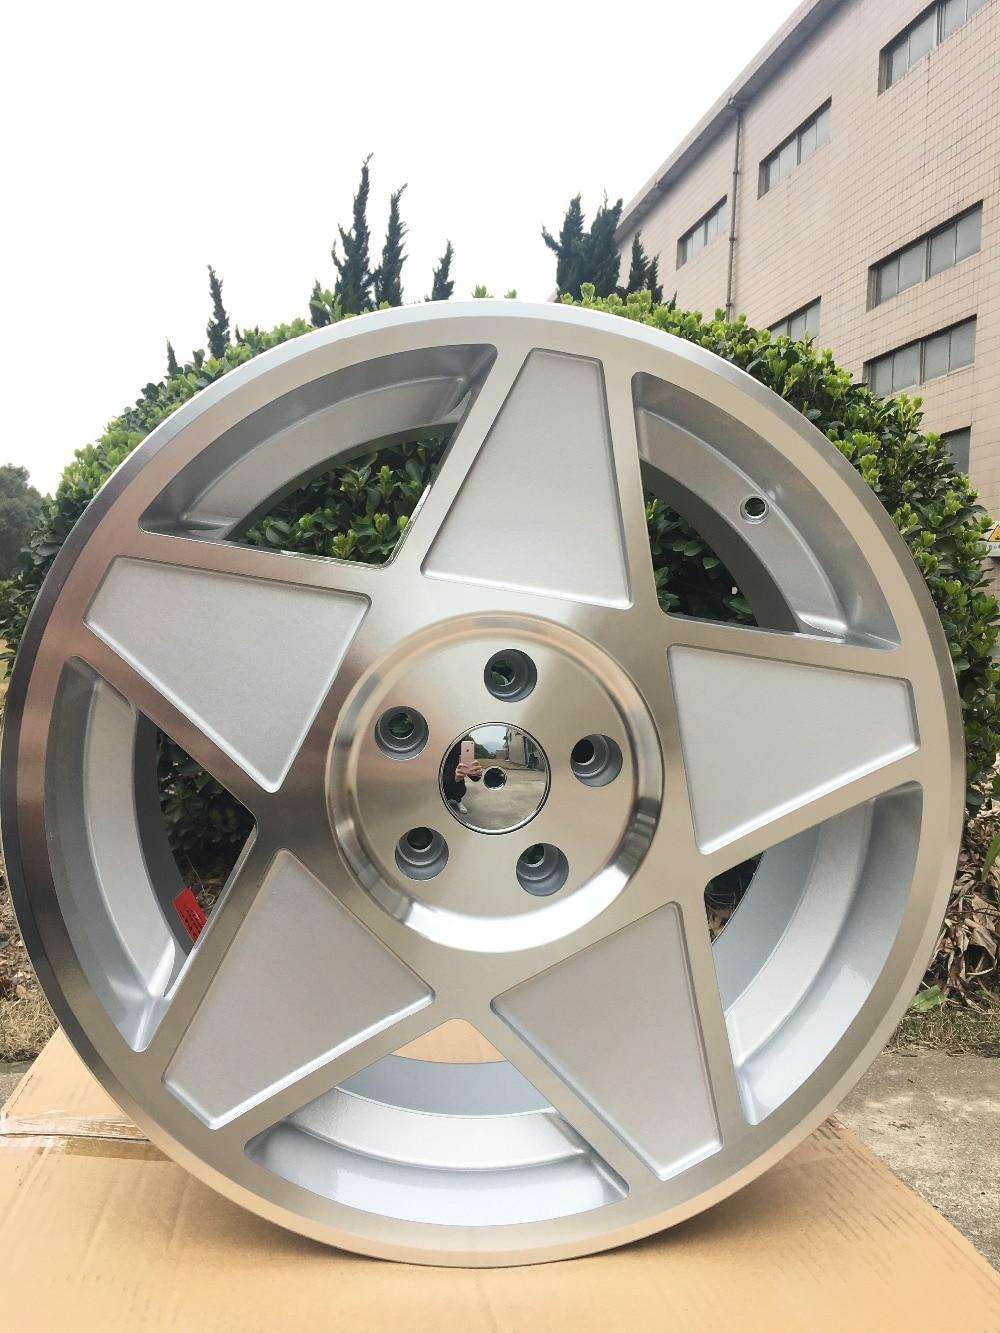 4 New 18 Rims wheels et 35mm Alloy Wheel Rims FITS AUDI MERCEDES BENZ VW 5X112 +35MM W030